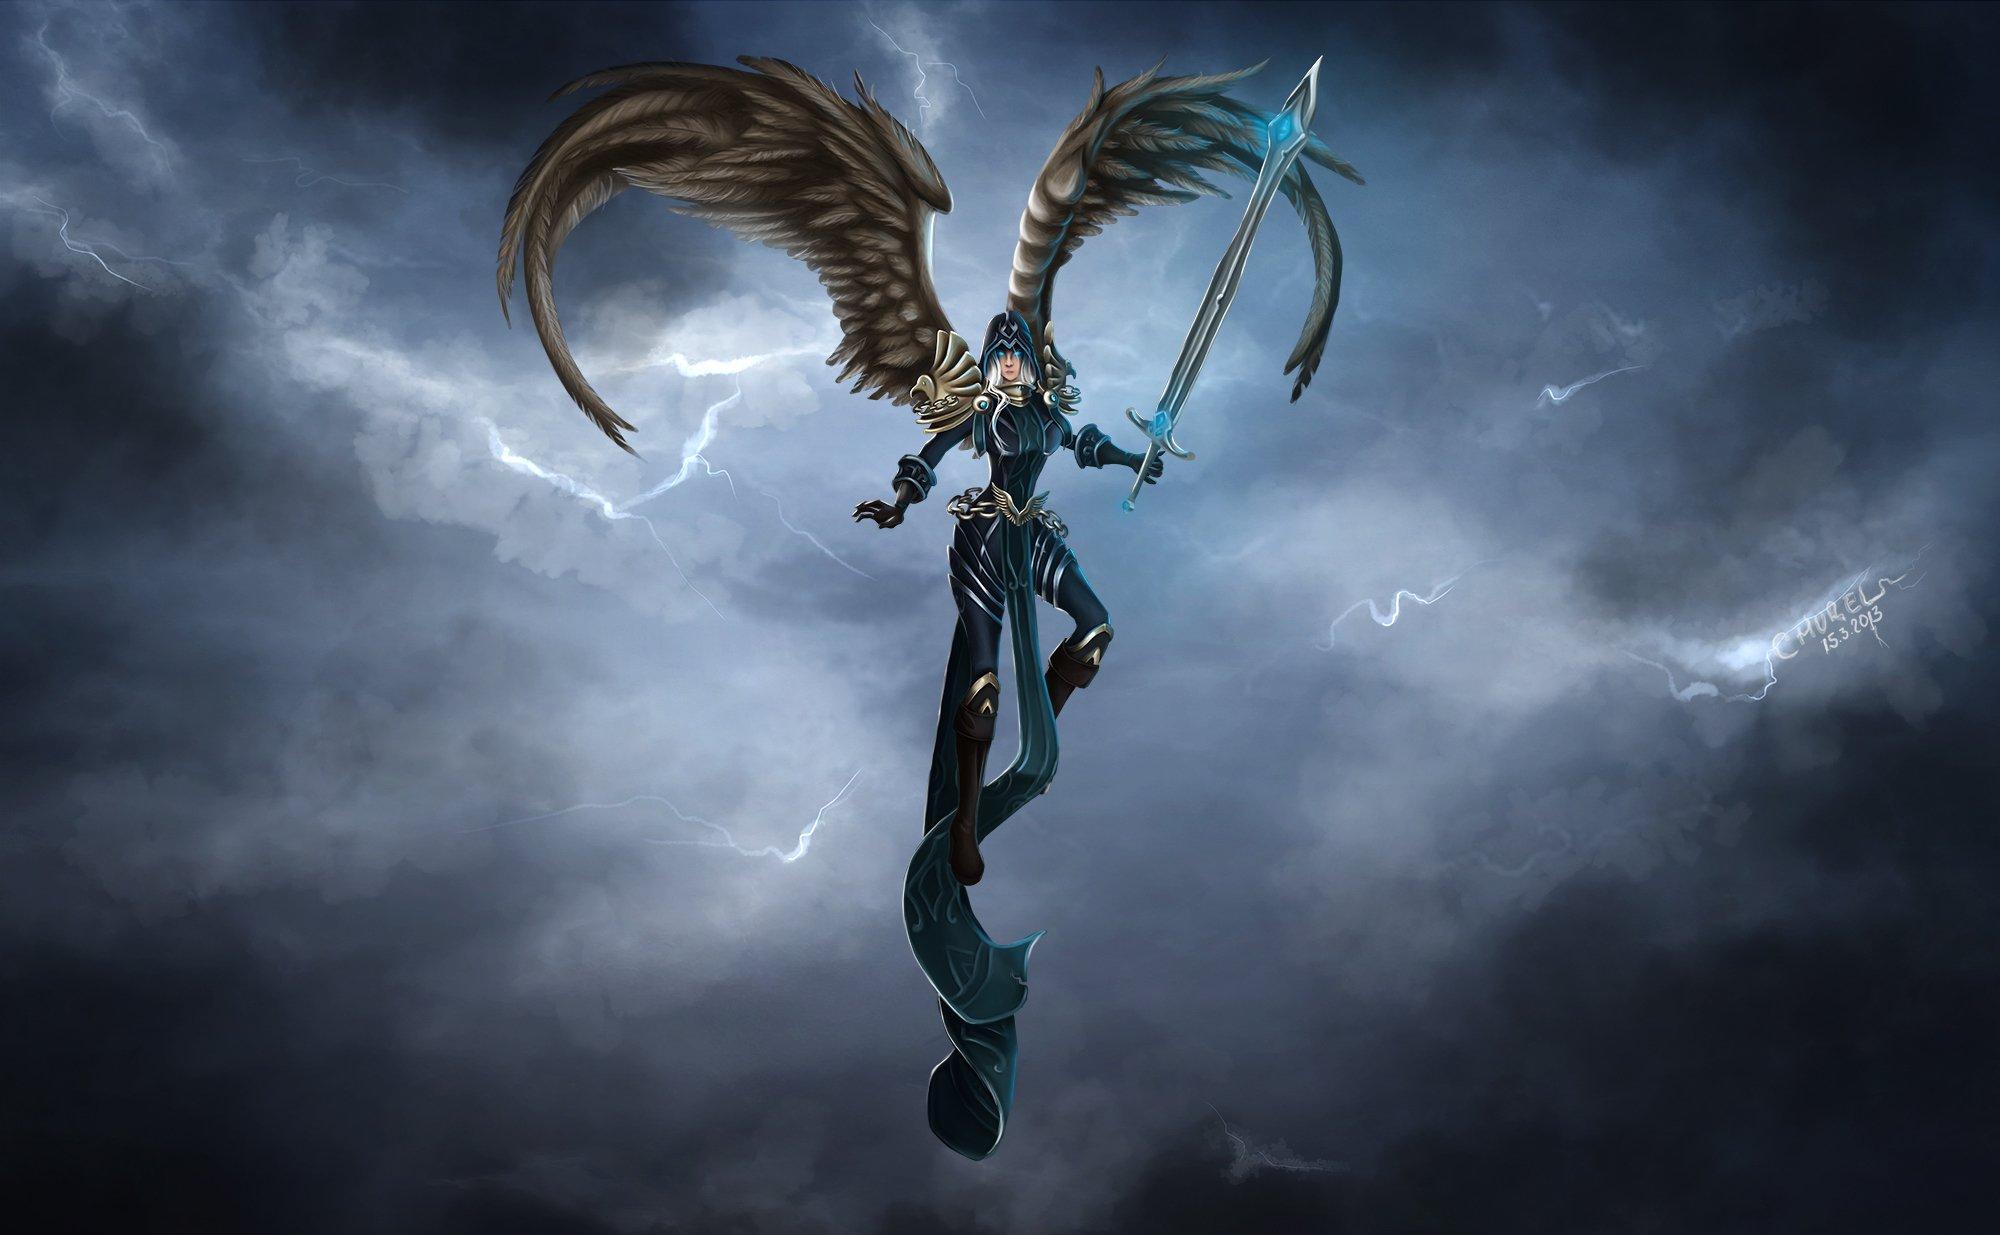 of Legends Warrior Kayle Swords Wings Games Fantasy angel wallpaper 2000x1235